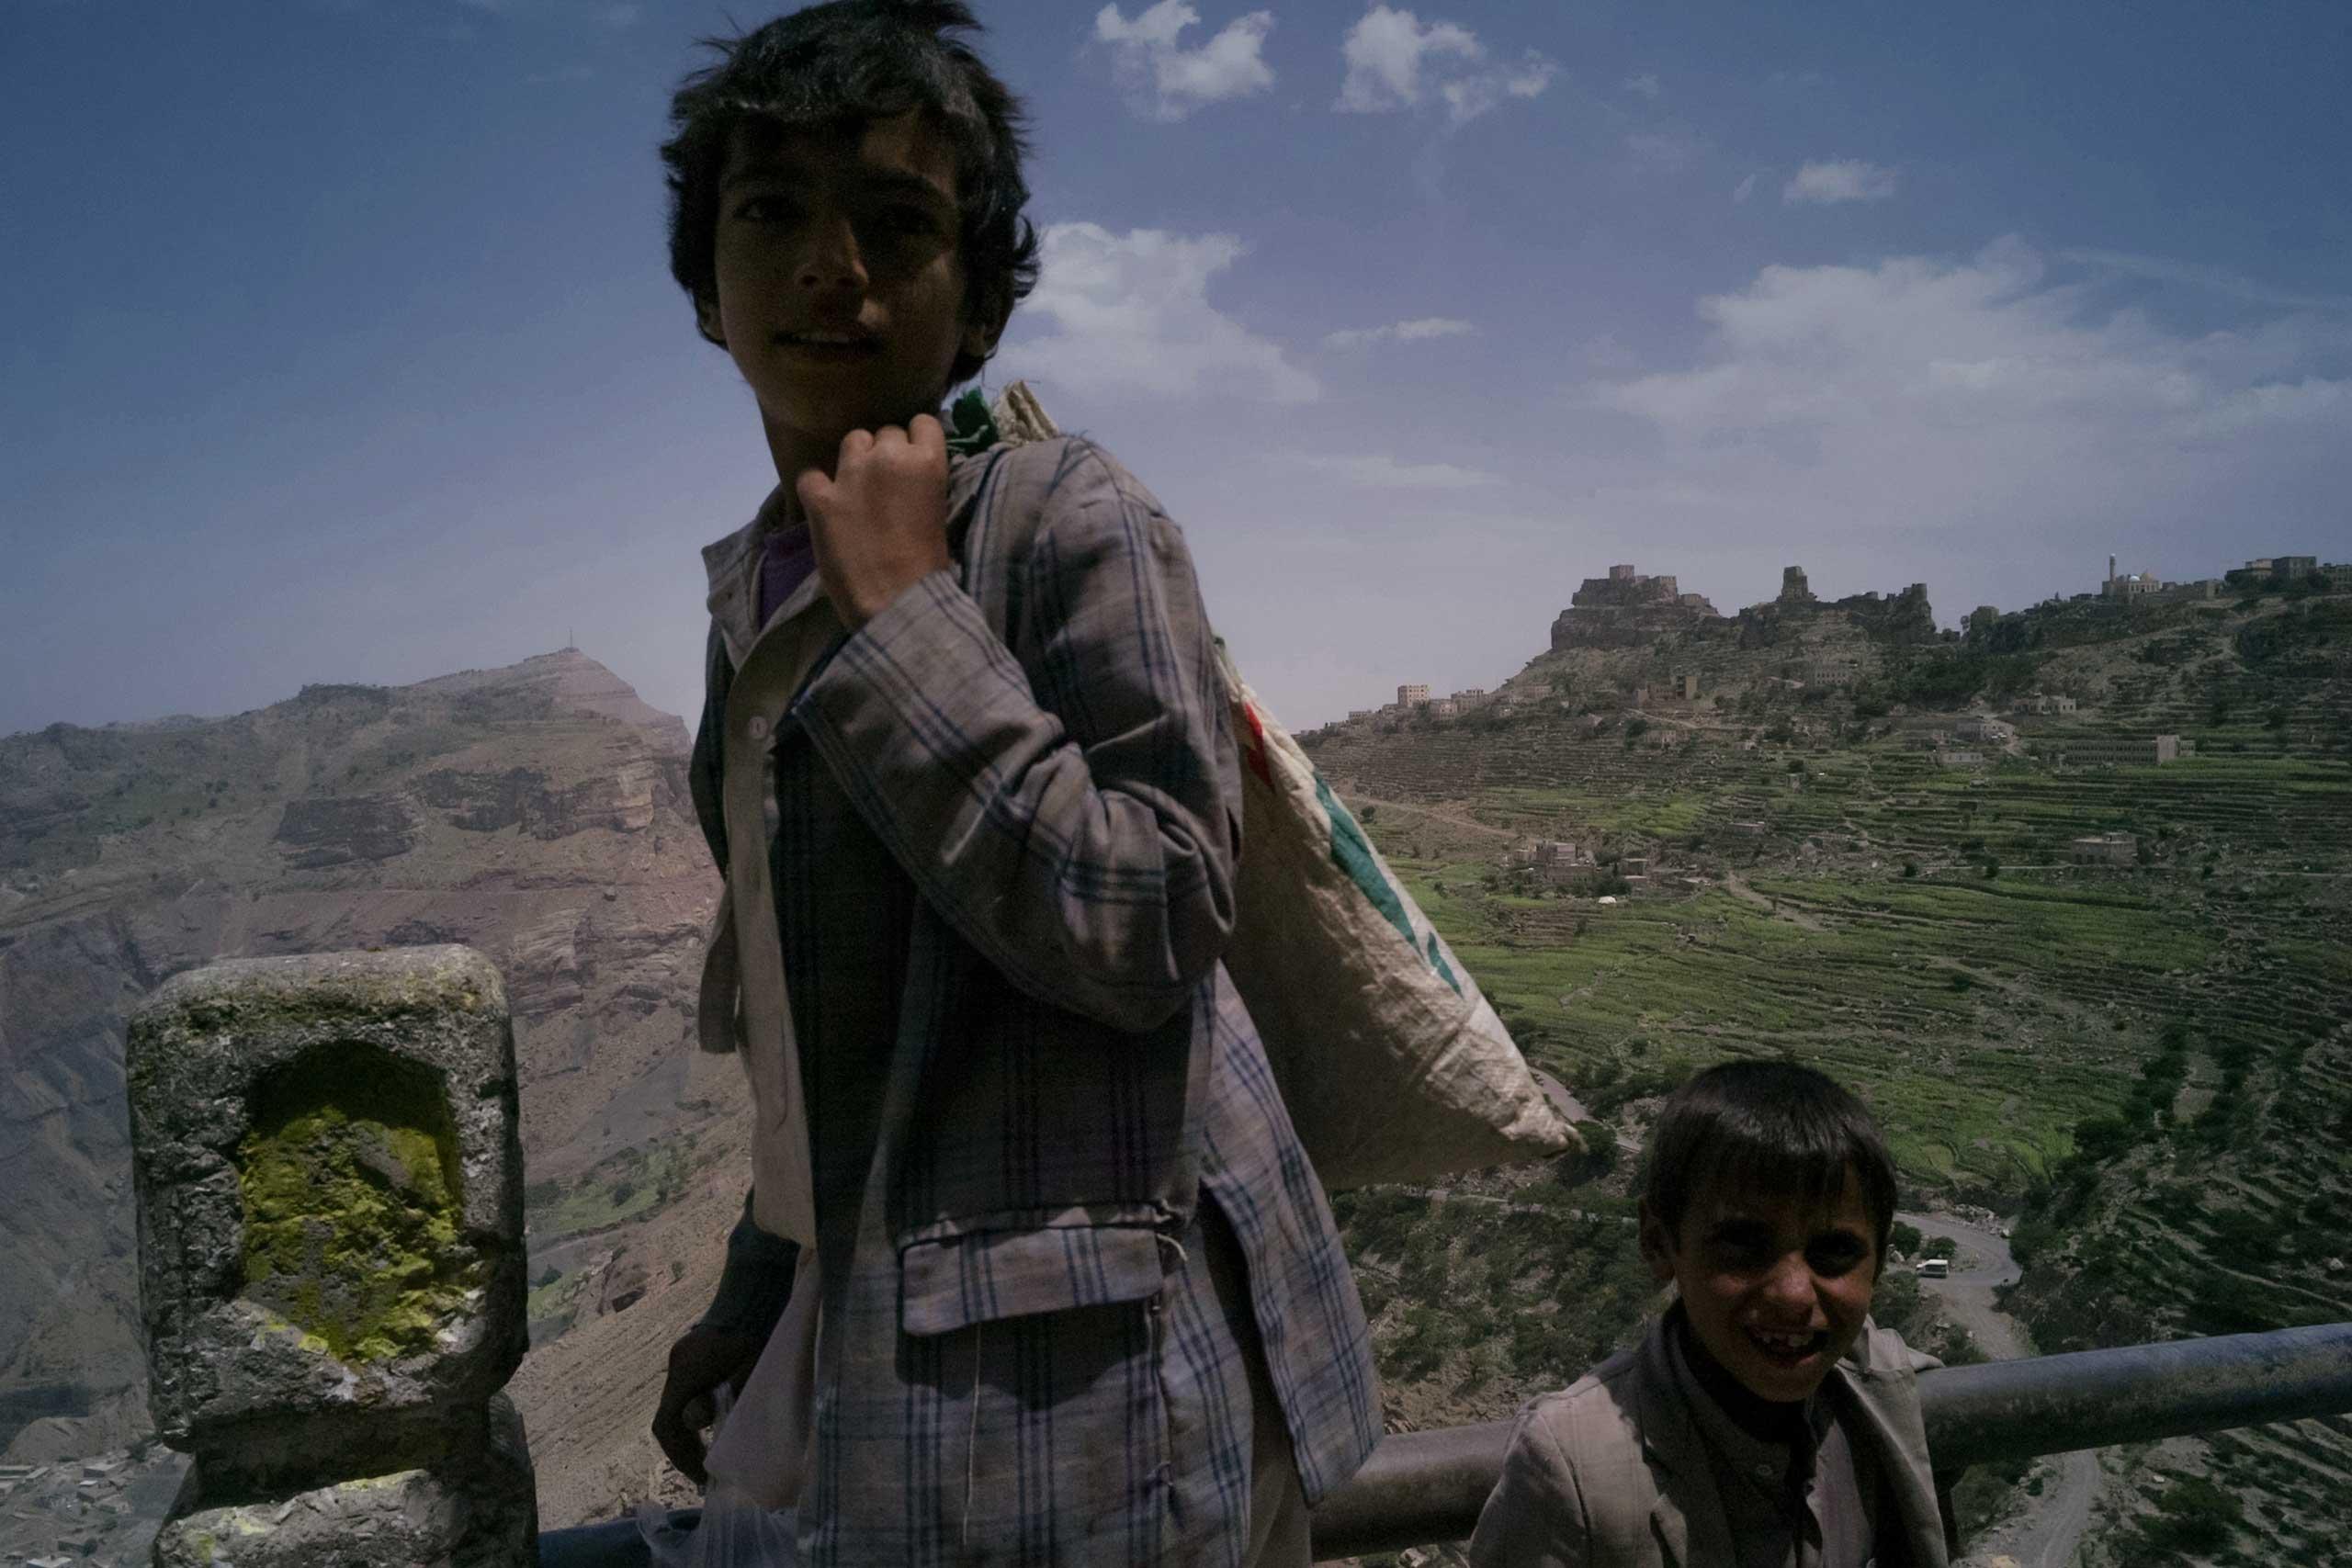 Two boys on the road to Hajjah in northwestern Yemen, Aug. 2015.